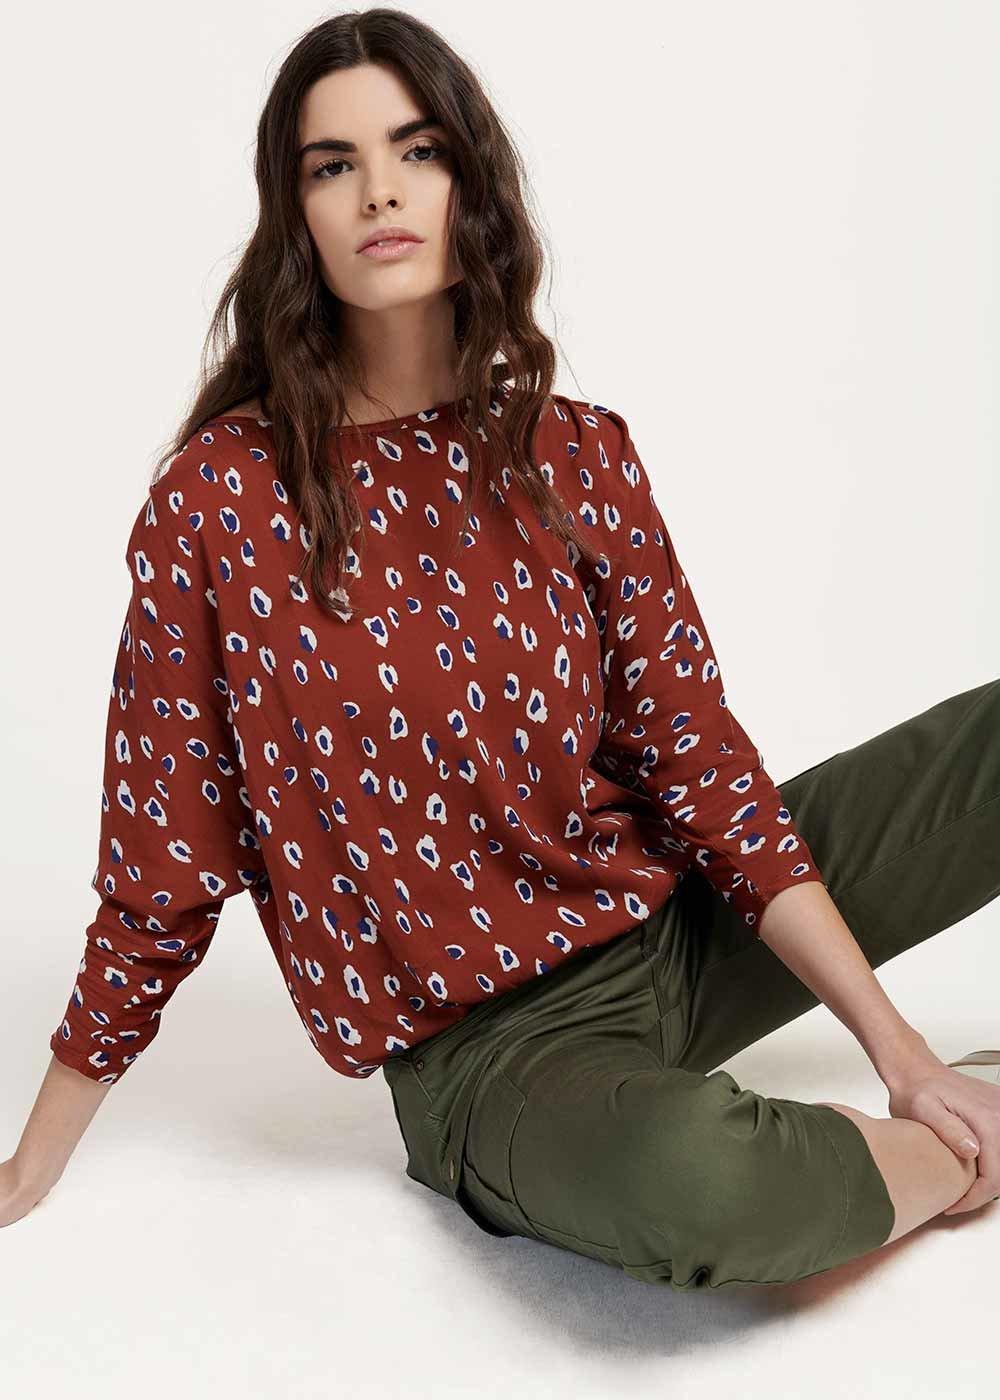 T-shirt Chiara a stampa macula - Coccio /  Marina Animalier - Donna